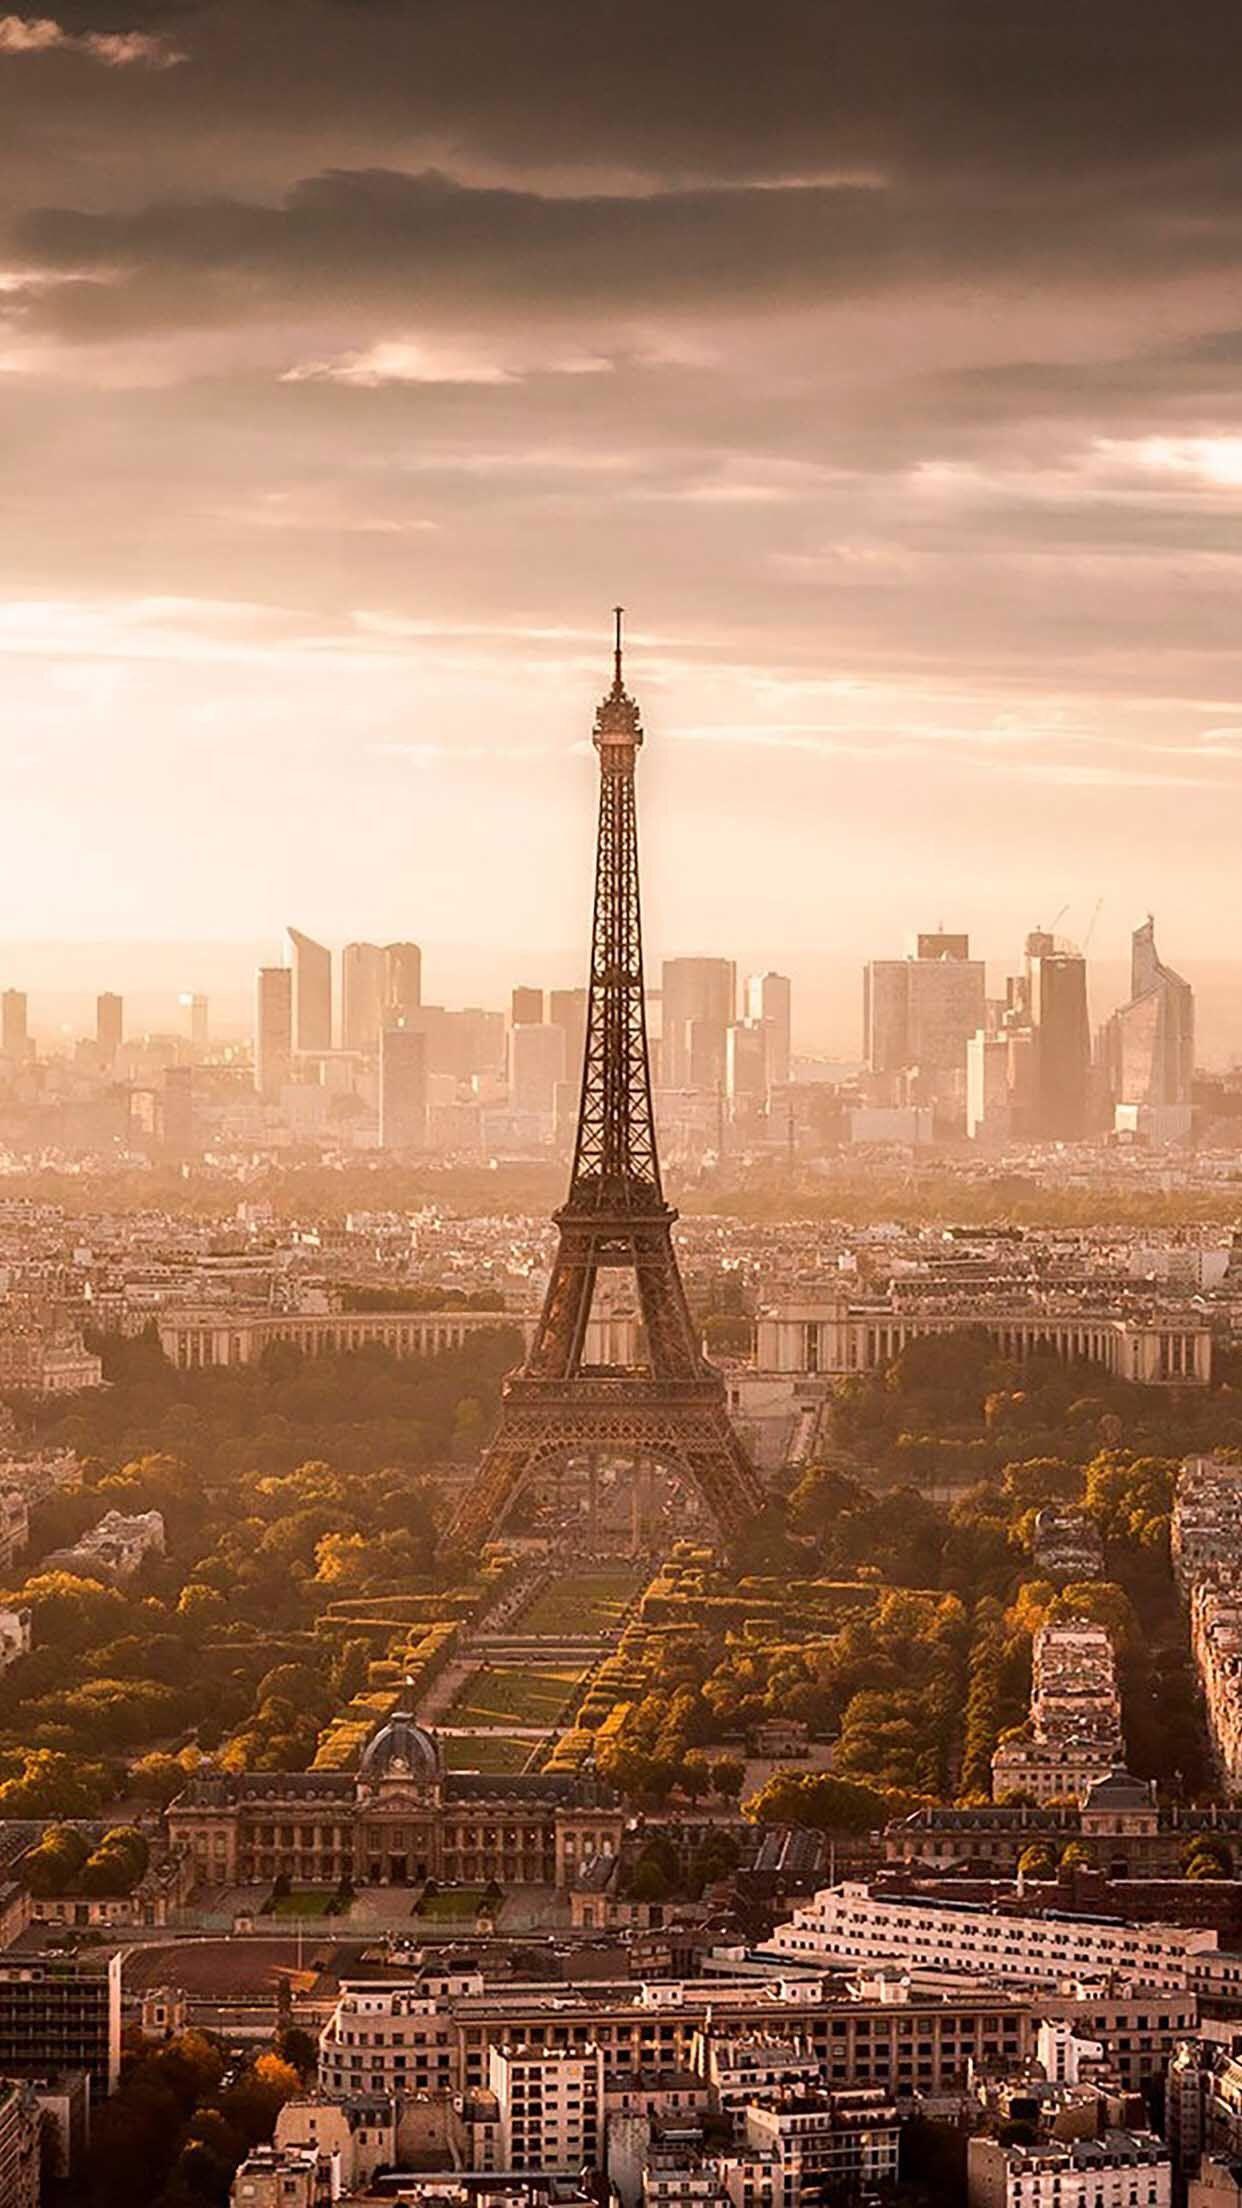 Pin By A V On Planos De Fundo France Wallpaper Paris Wallpaper Paris Photography